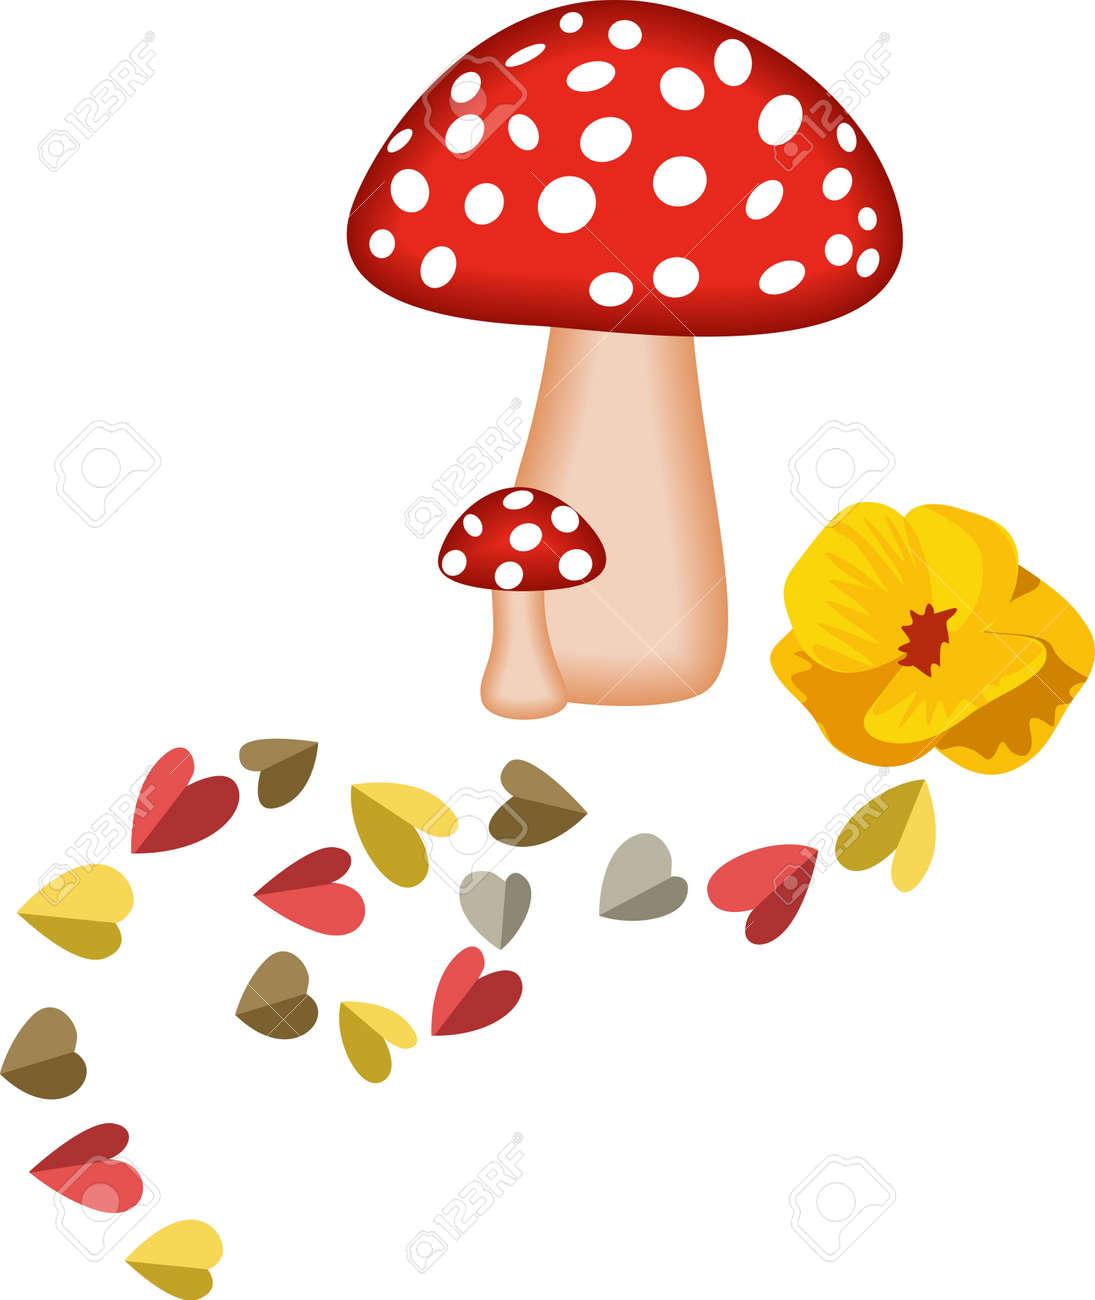 Magic Mushrooms and Hearts - 14403050